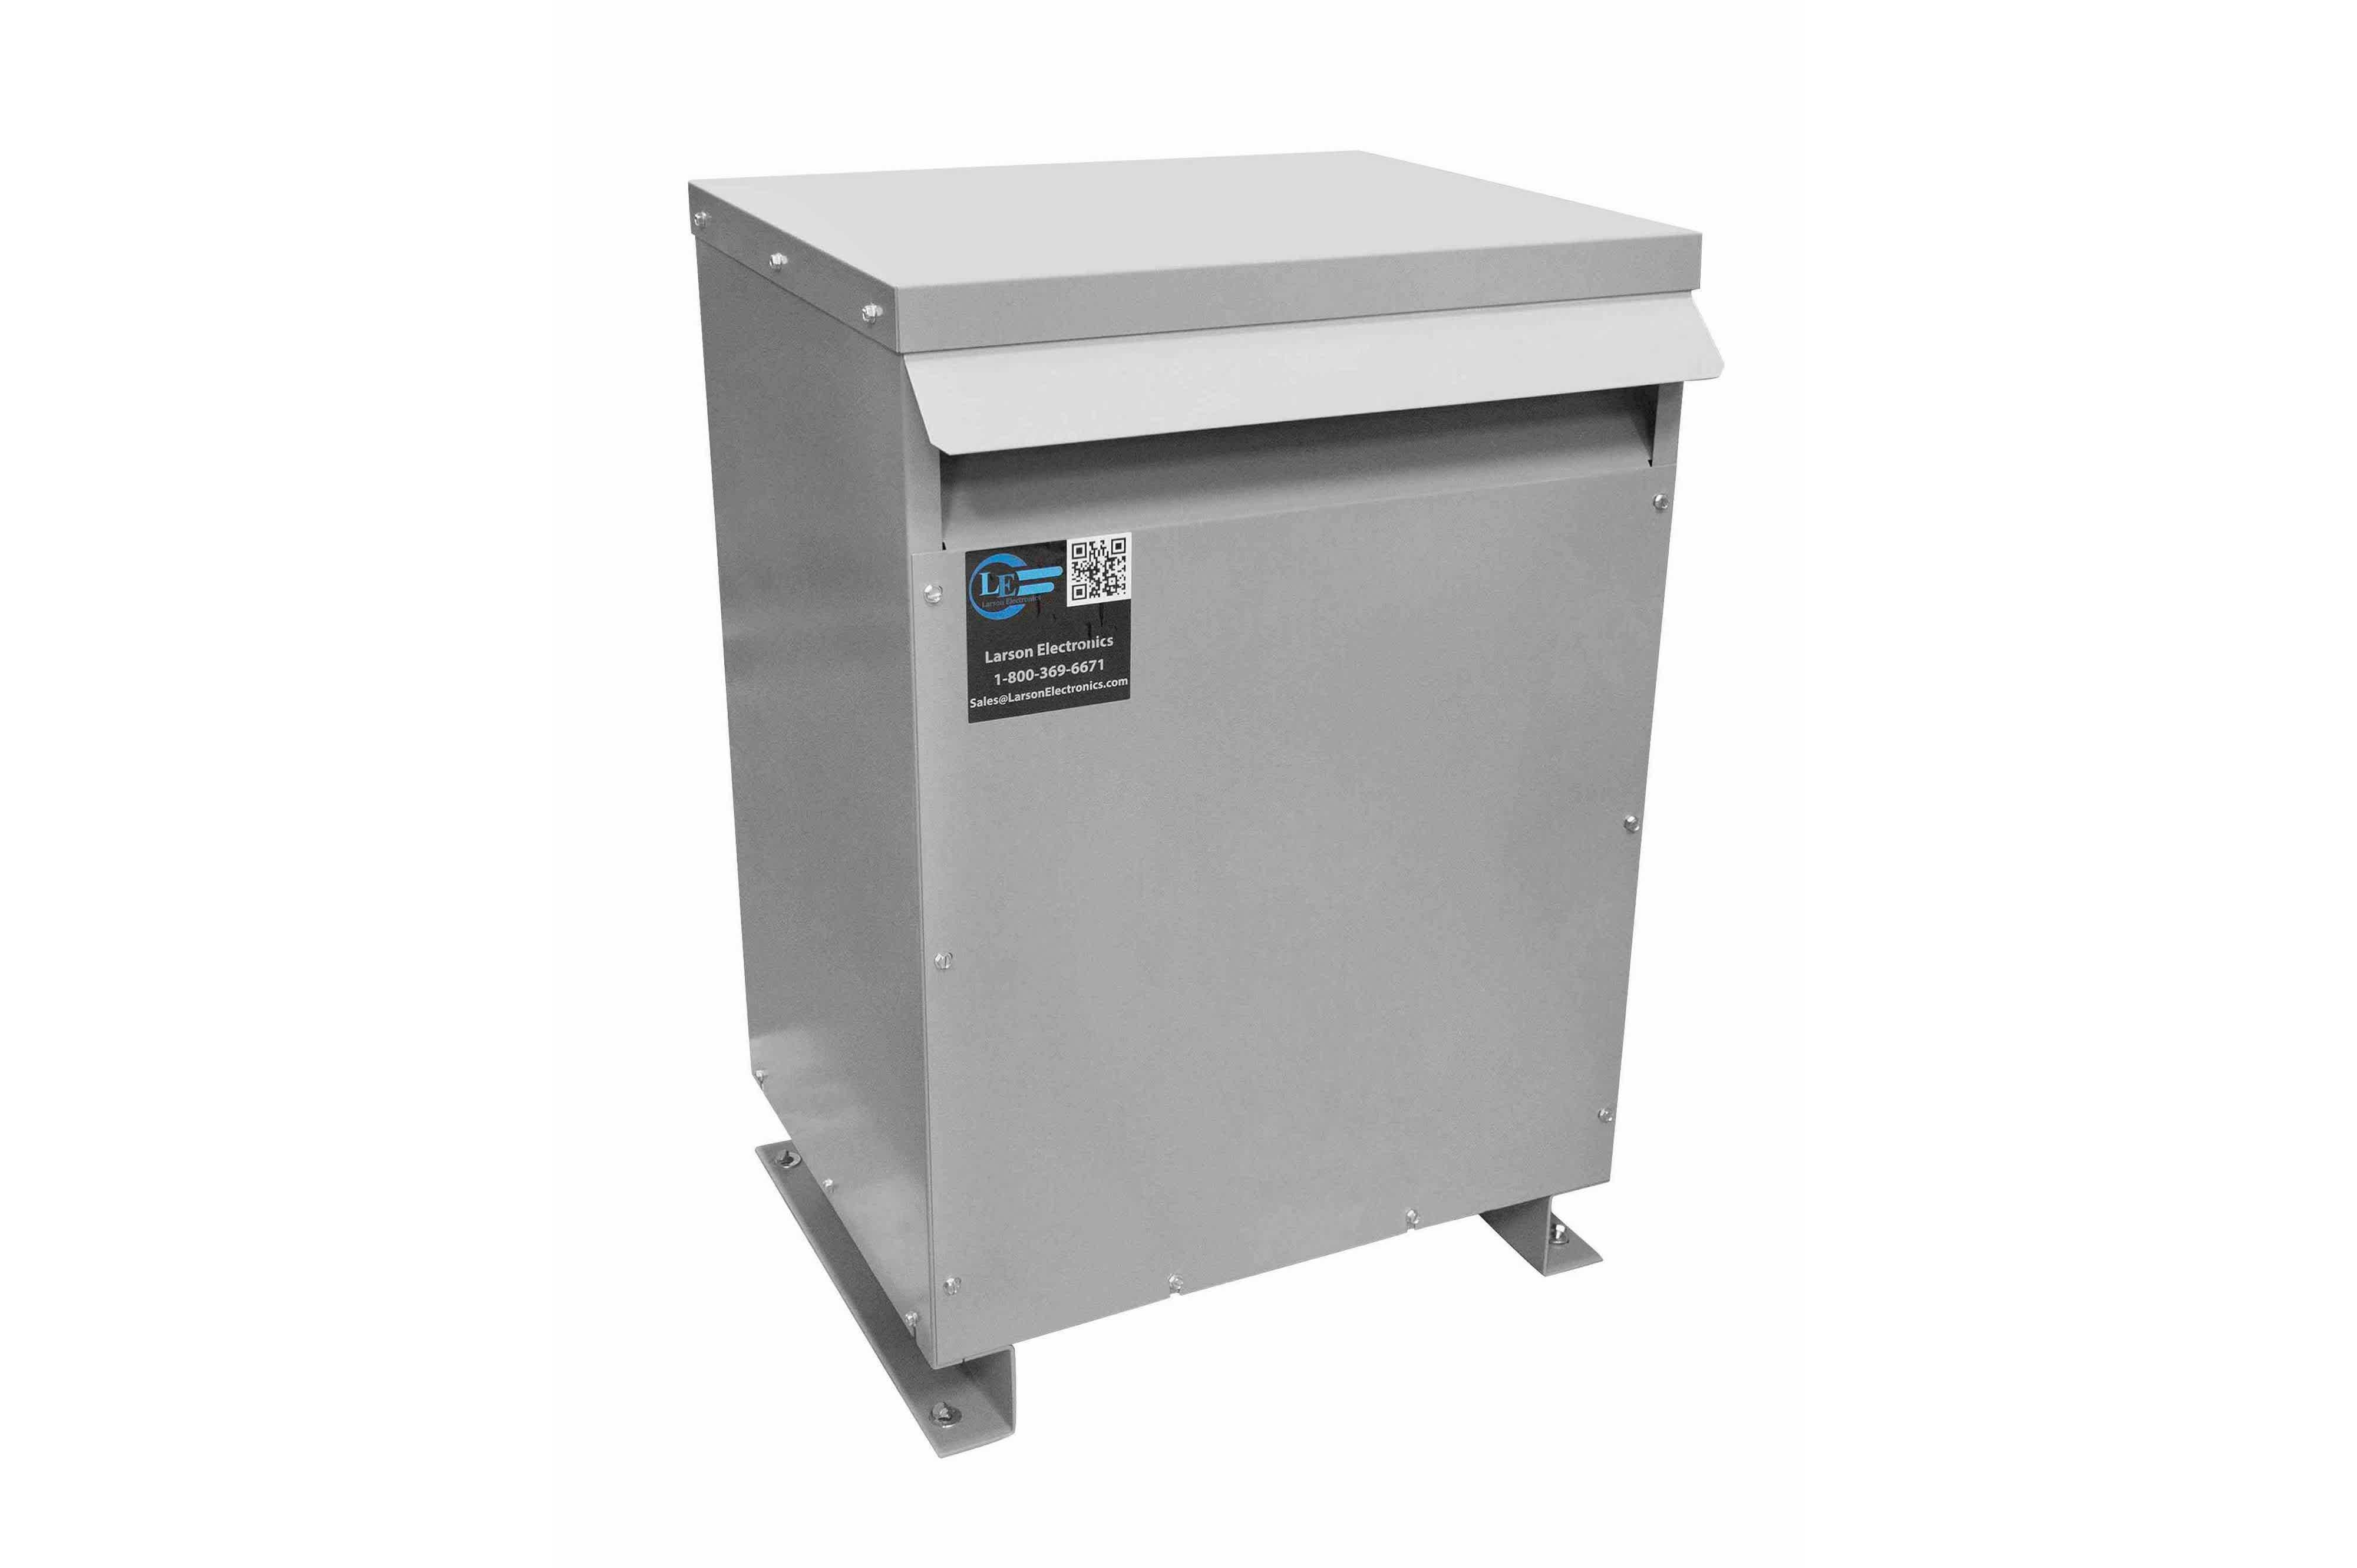 50 kVA 3PH DOE Transformer, 240V Delta Primary, 380Y/220 Wye-N Secondary, N3R, Ventilated, 60 Hz